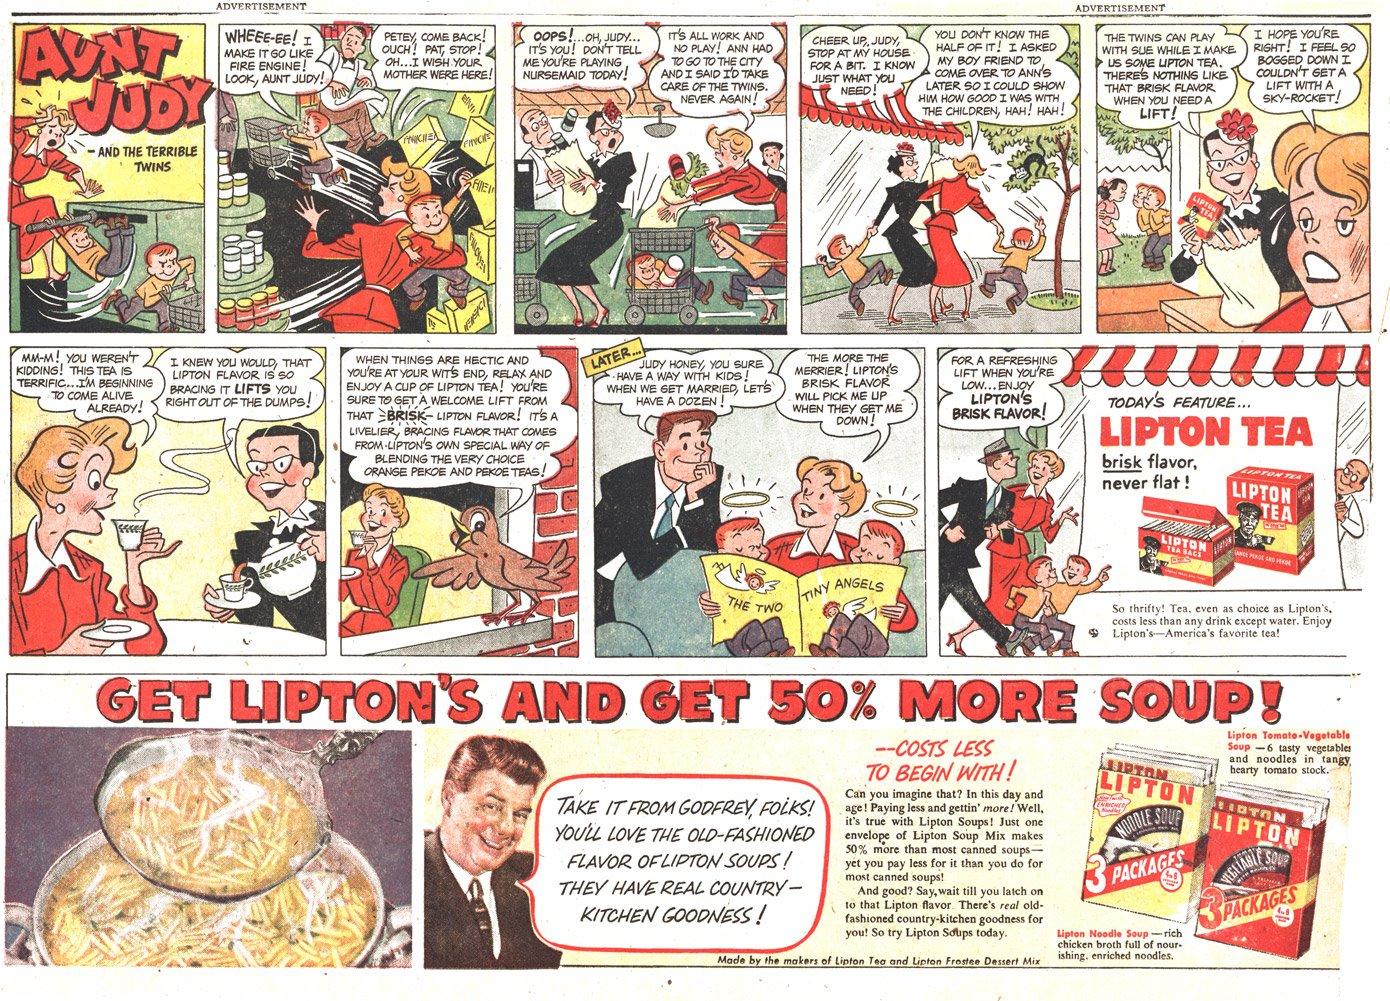 Lipton Tea ad by Dik Browne, March 1951.